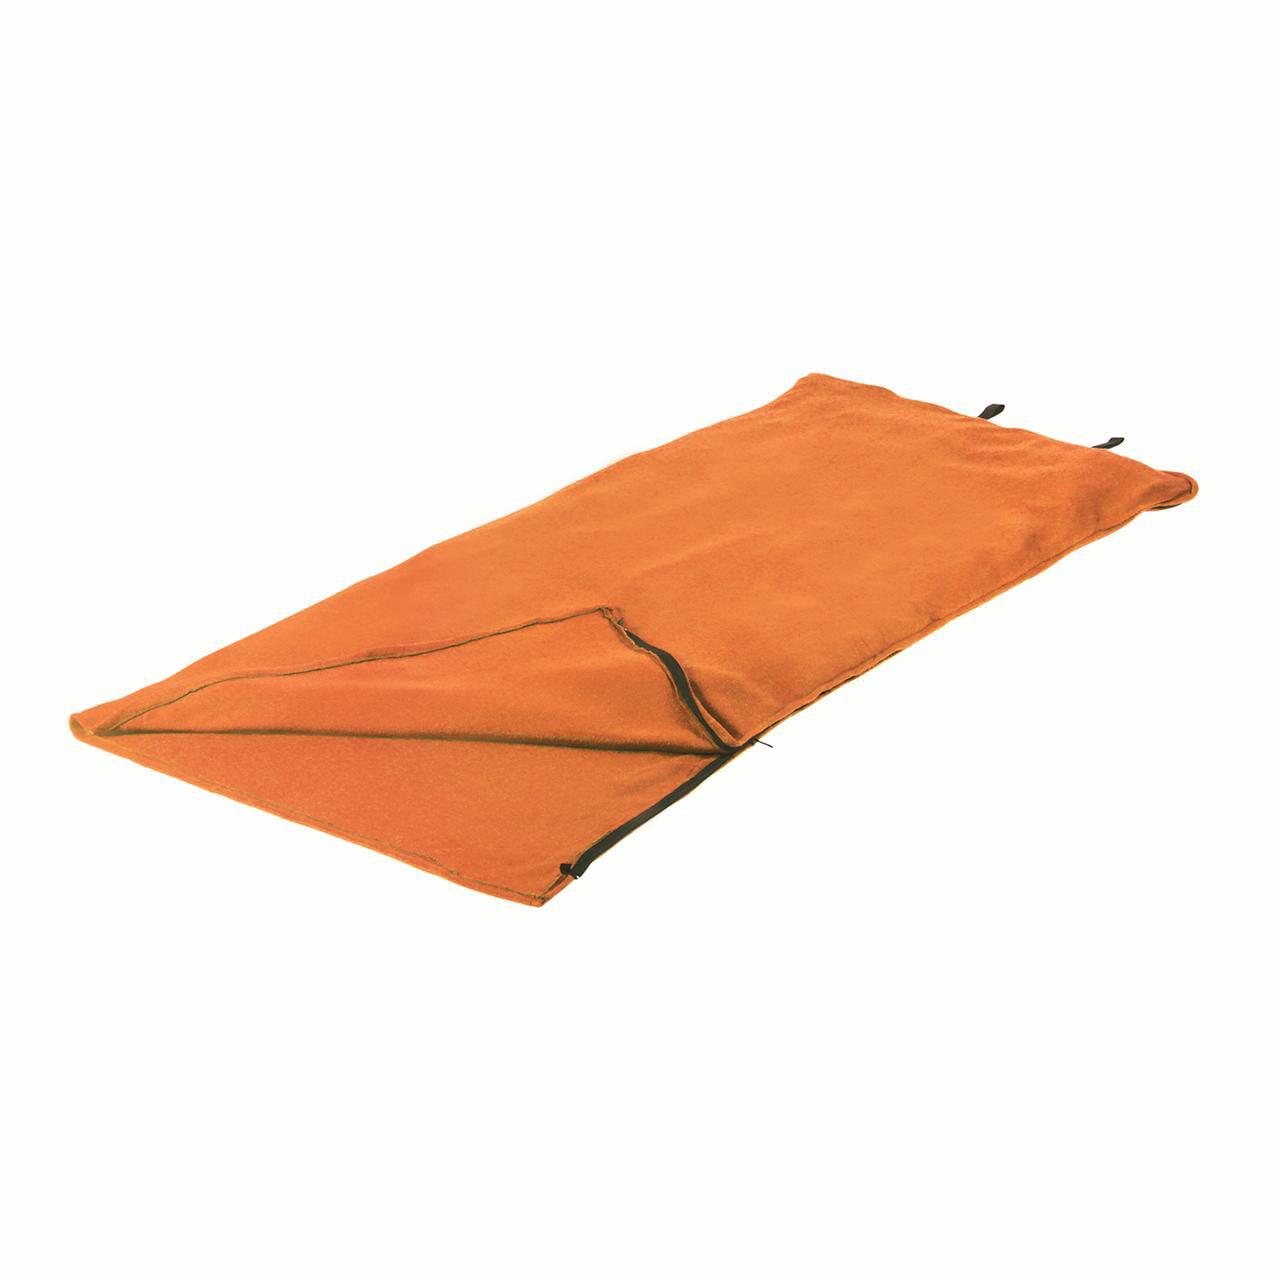 "Stansport Fleece Sleeping Bag 32"" x 75"" Orange by Stansport"